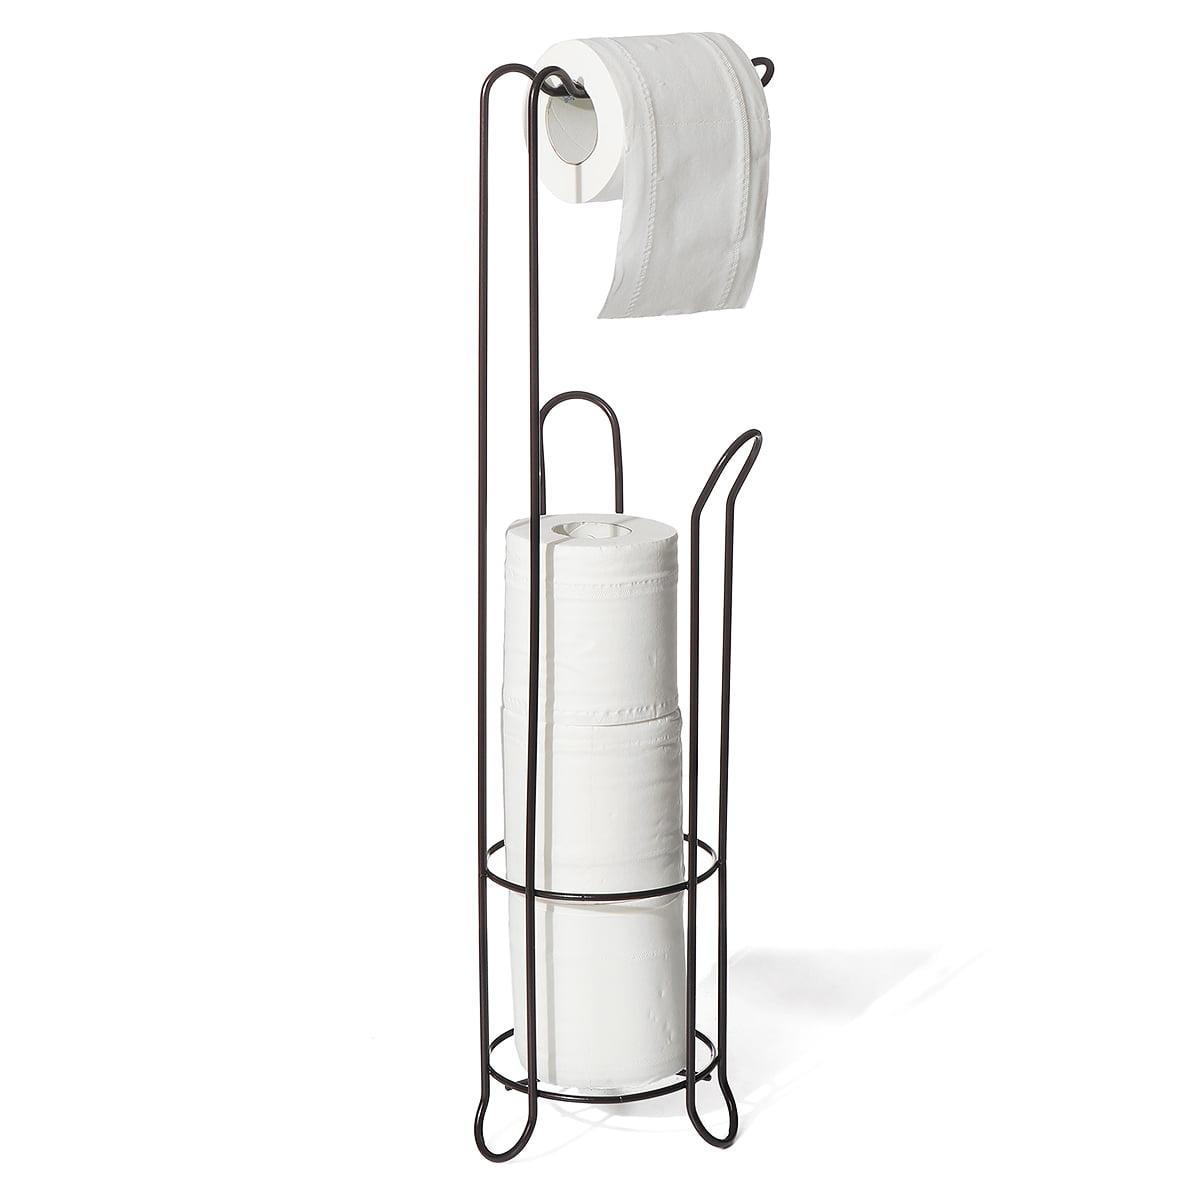 Toilet Paper Holder Stand With Reserve Toilet Paper Storage Toilet Paper Dispenser Free Standing Toilet Paper Holder Bathroom Toilet Roll Holder For Toilet Tissue Chrome Finish Walmart Com Walmart Com